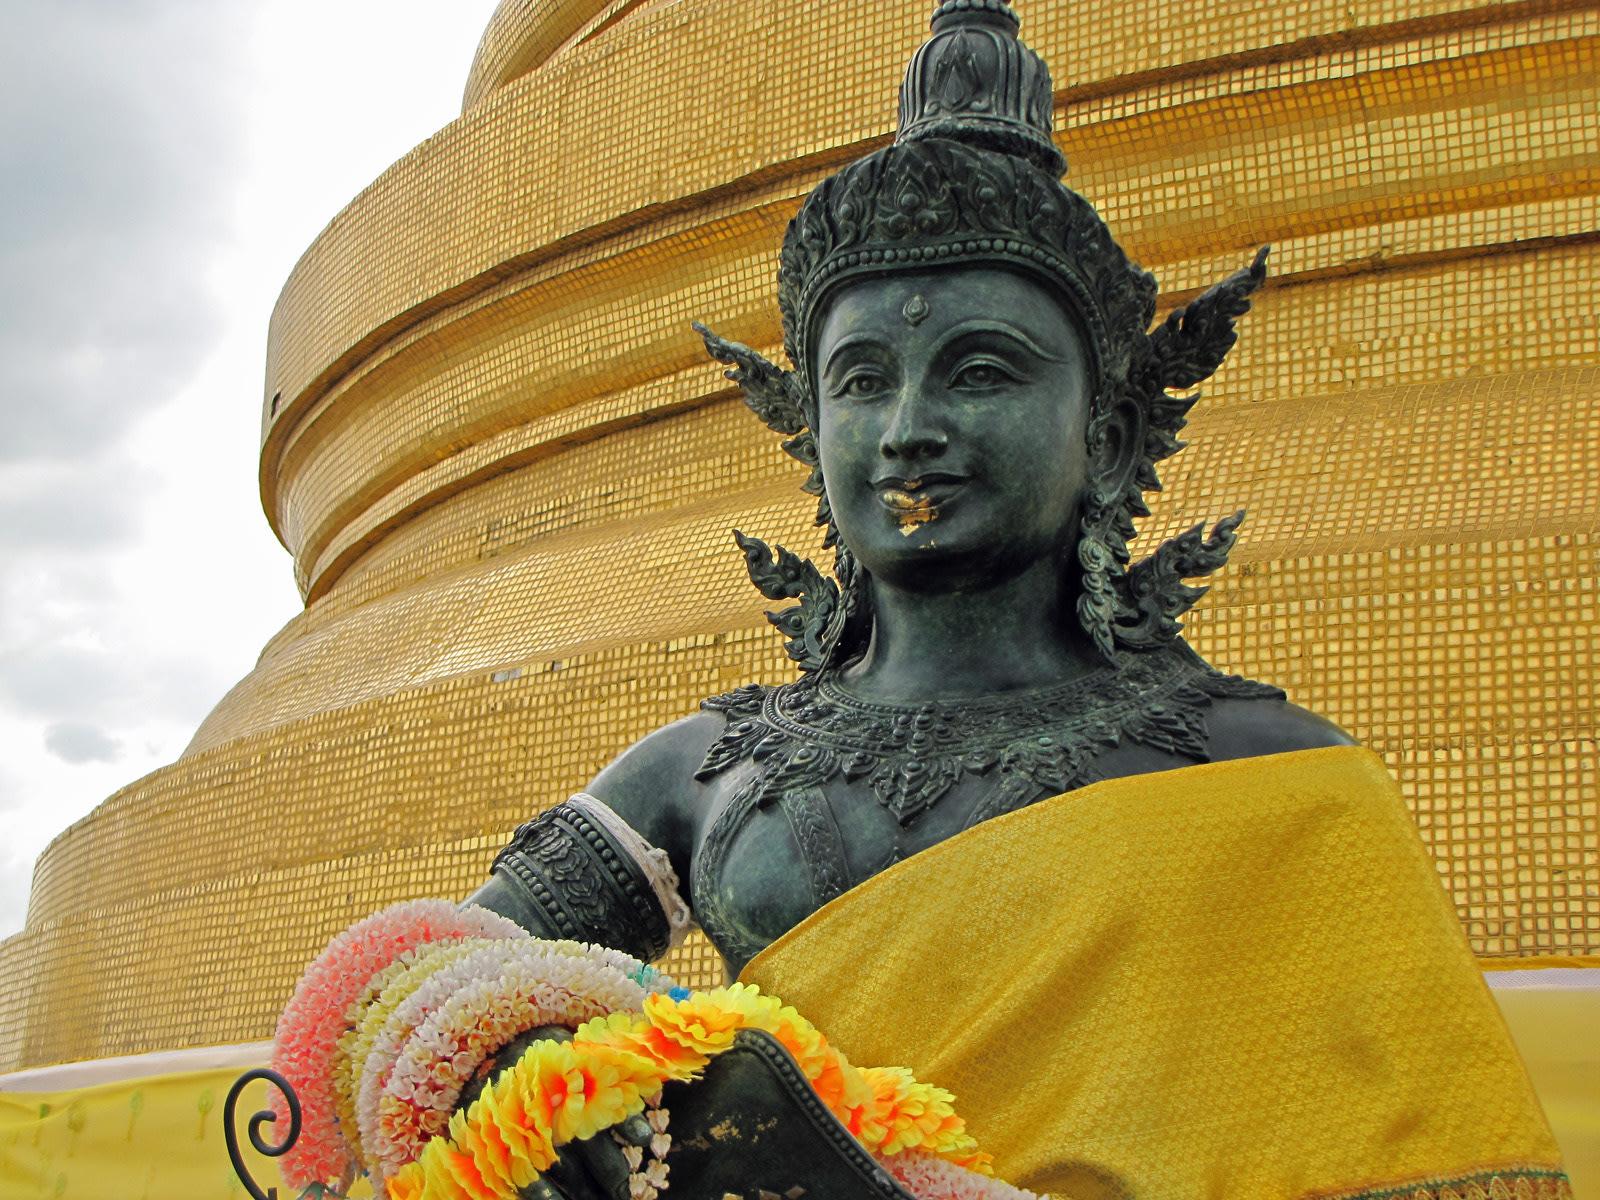 In cima al Wat Saket, la montagna dorata. Cabiria Magni